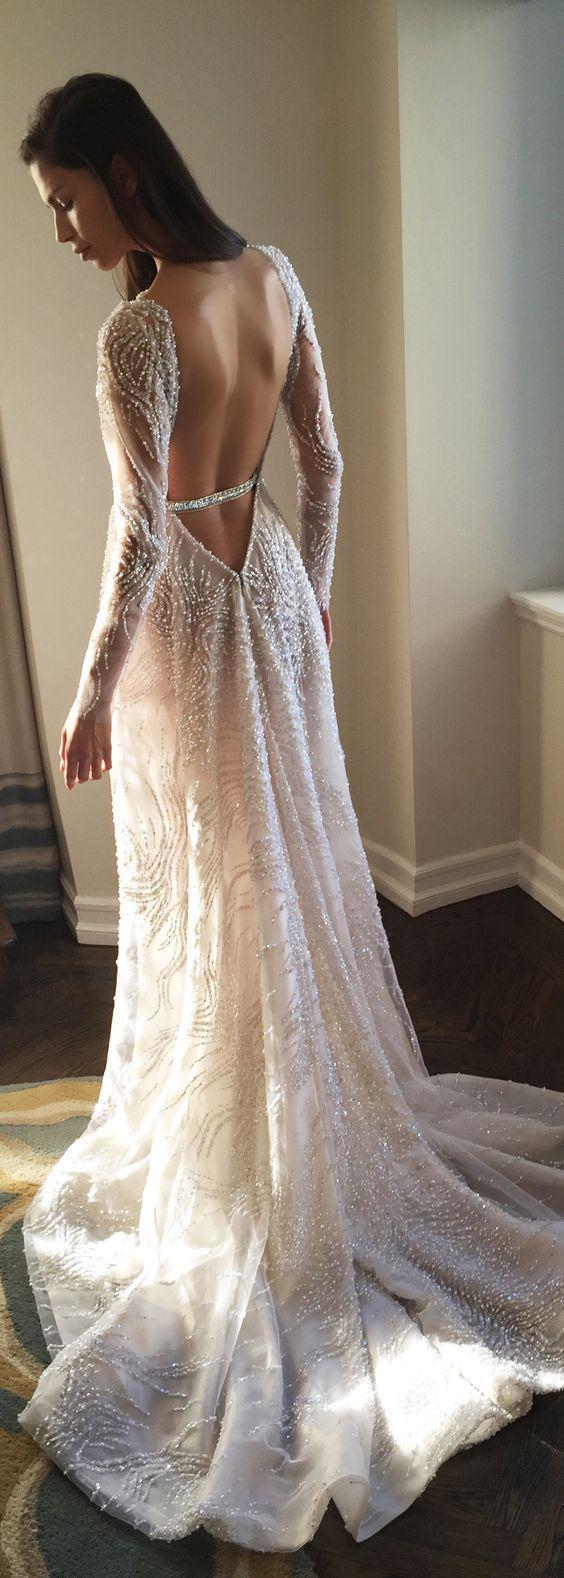 Wedding Dress: Idan Cohen